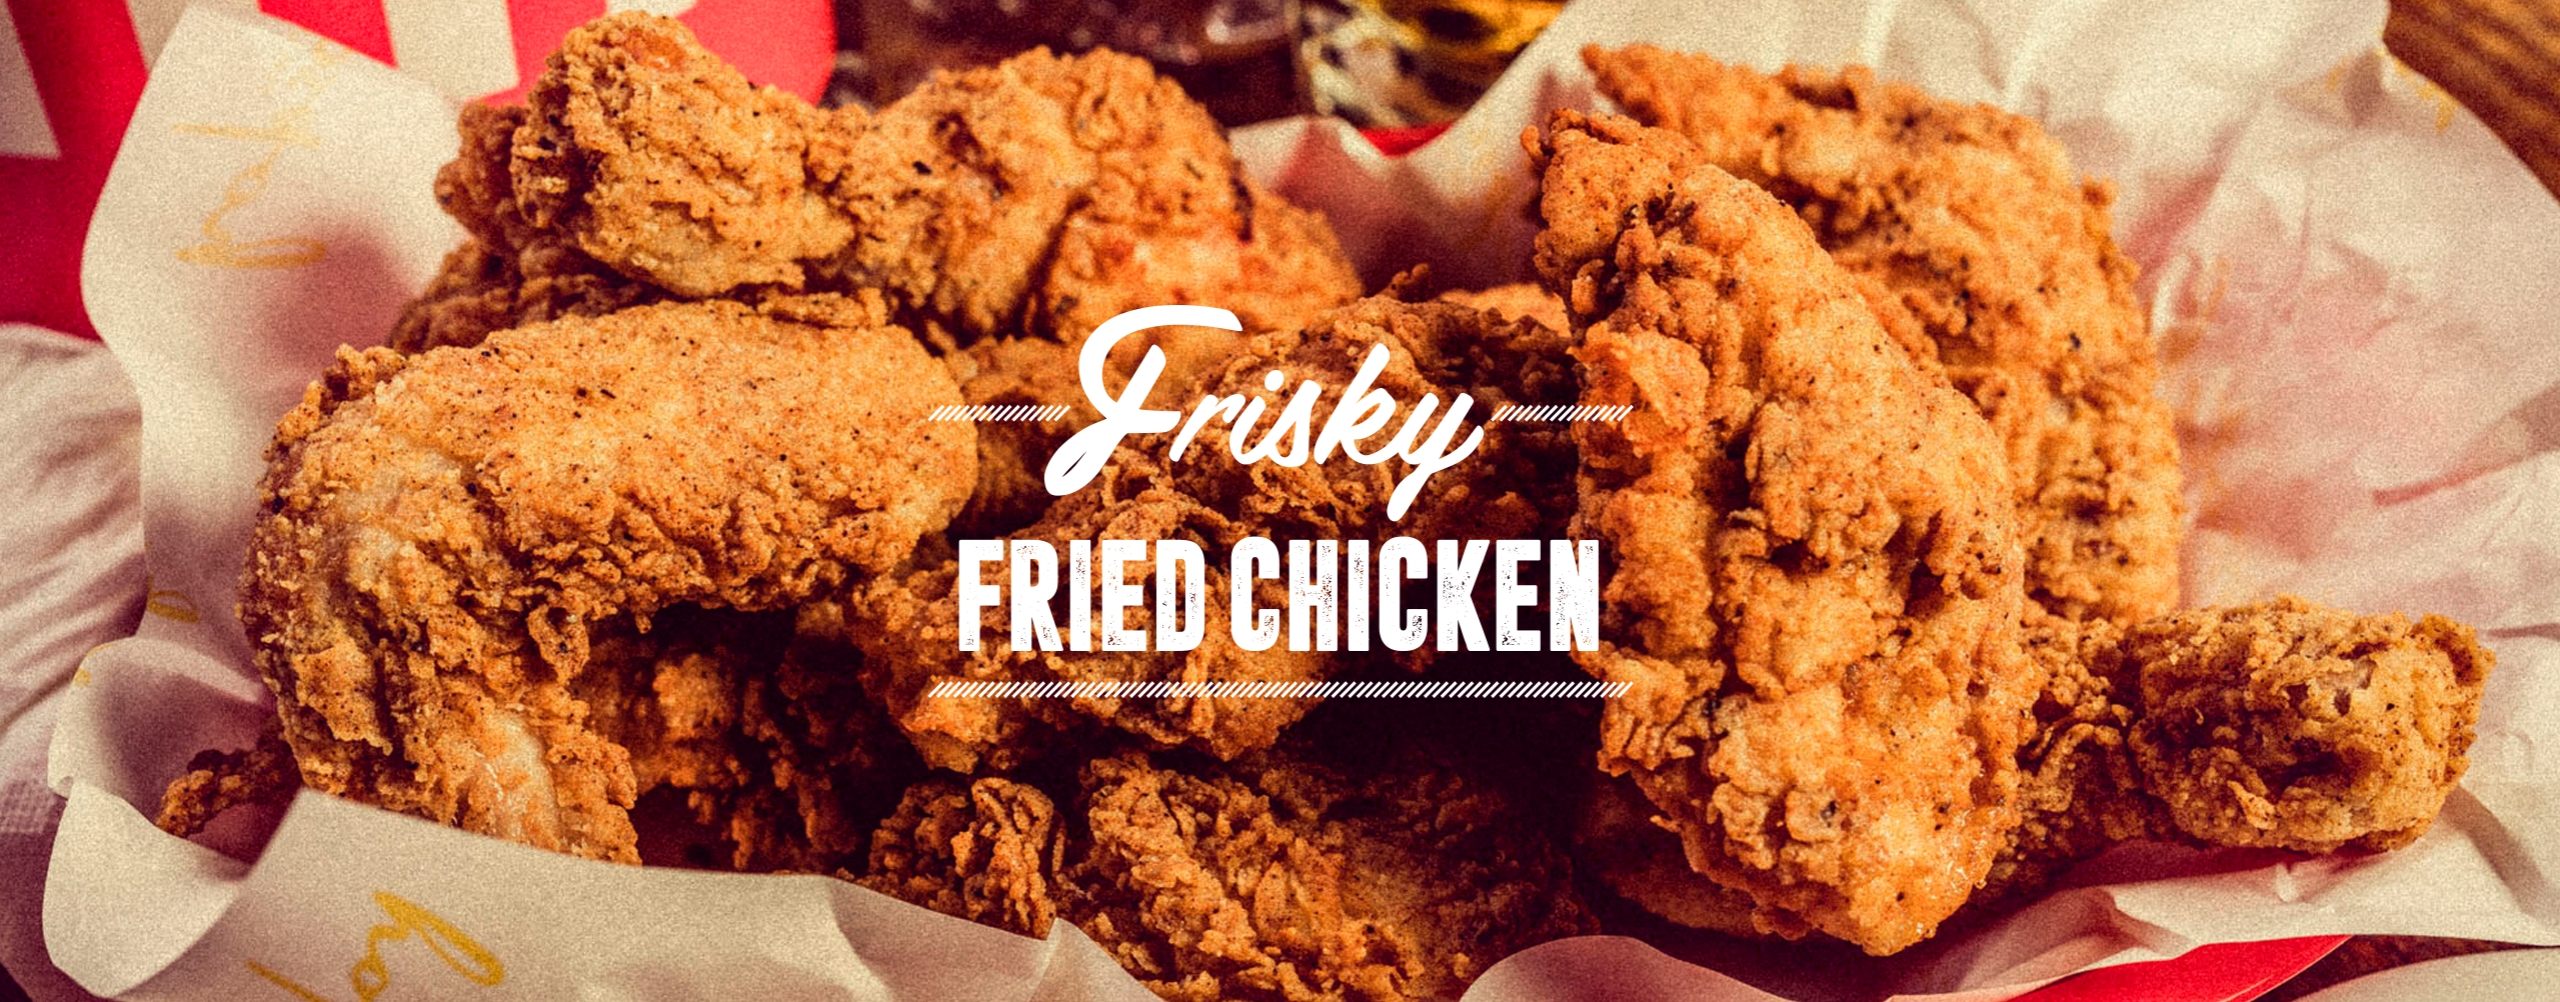 frisky-chicken-2560x1002_c